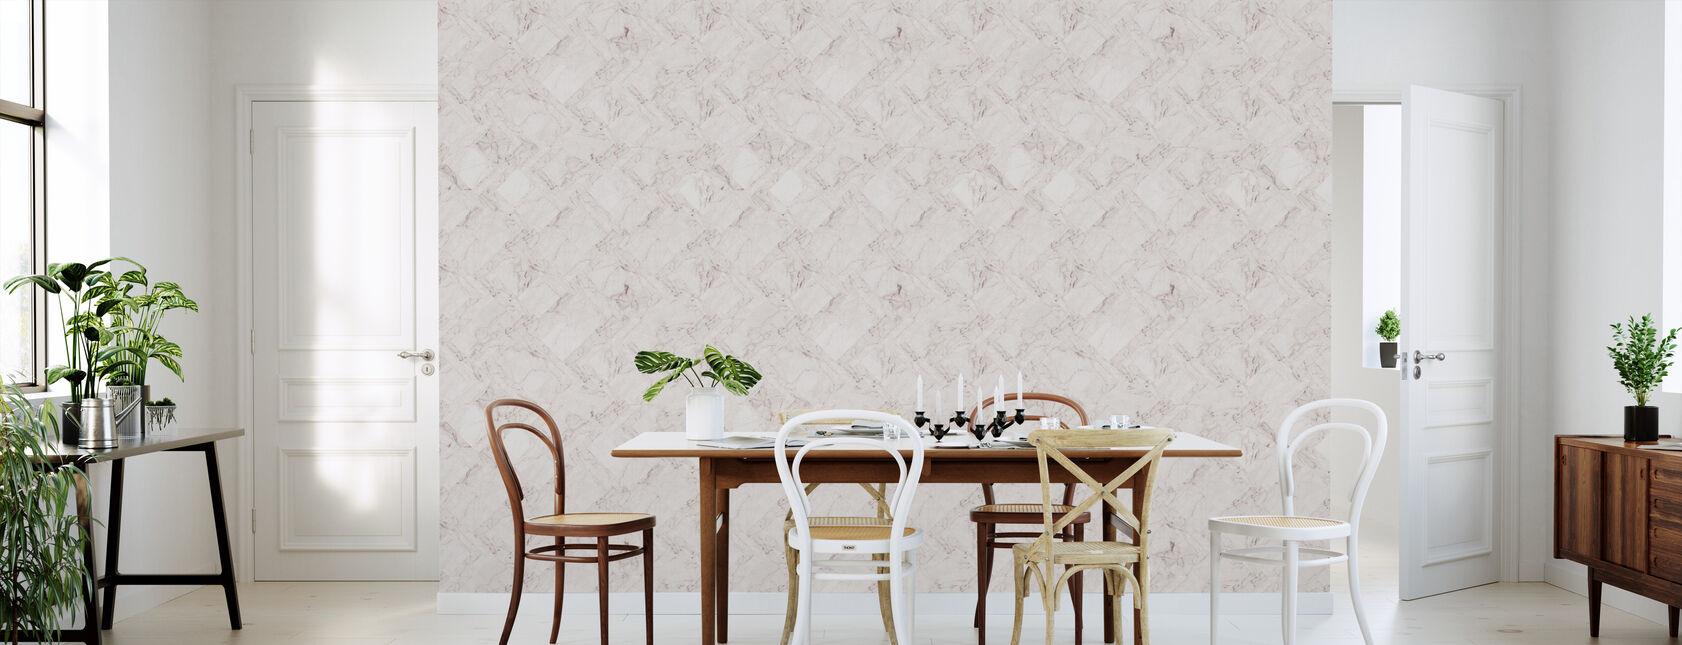 Marble Tiles - Pink - Wallpaper - Kitchen